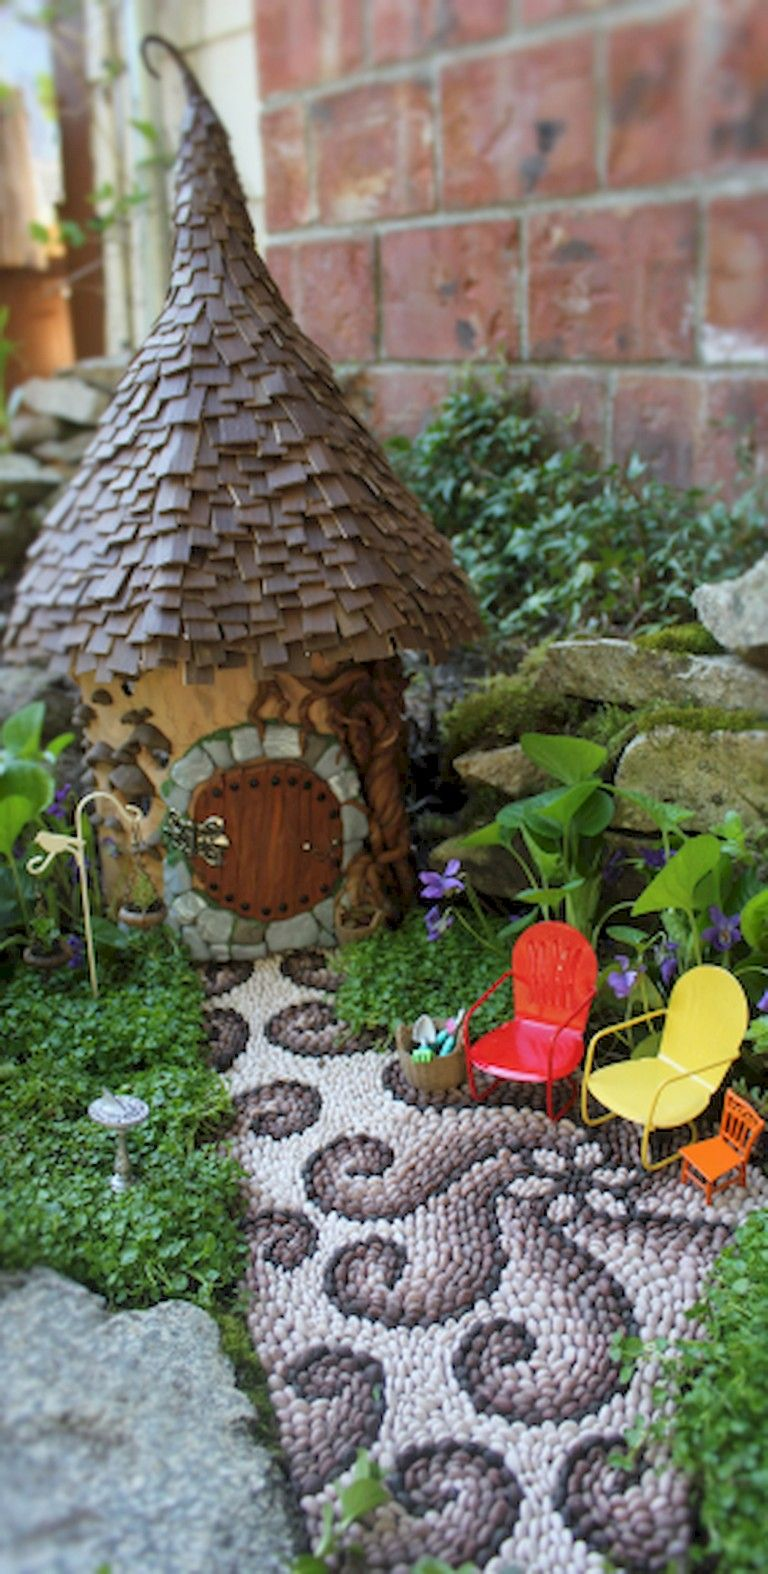 125 Good Backyard Fairy Garden Ideas On A Budget Page 83 Of 132 Fairy Garden Diy Diy Fairy Fairy Garden Designs